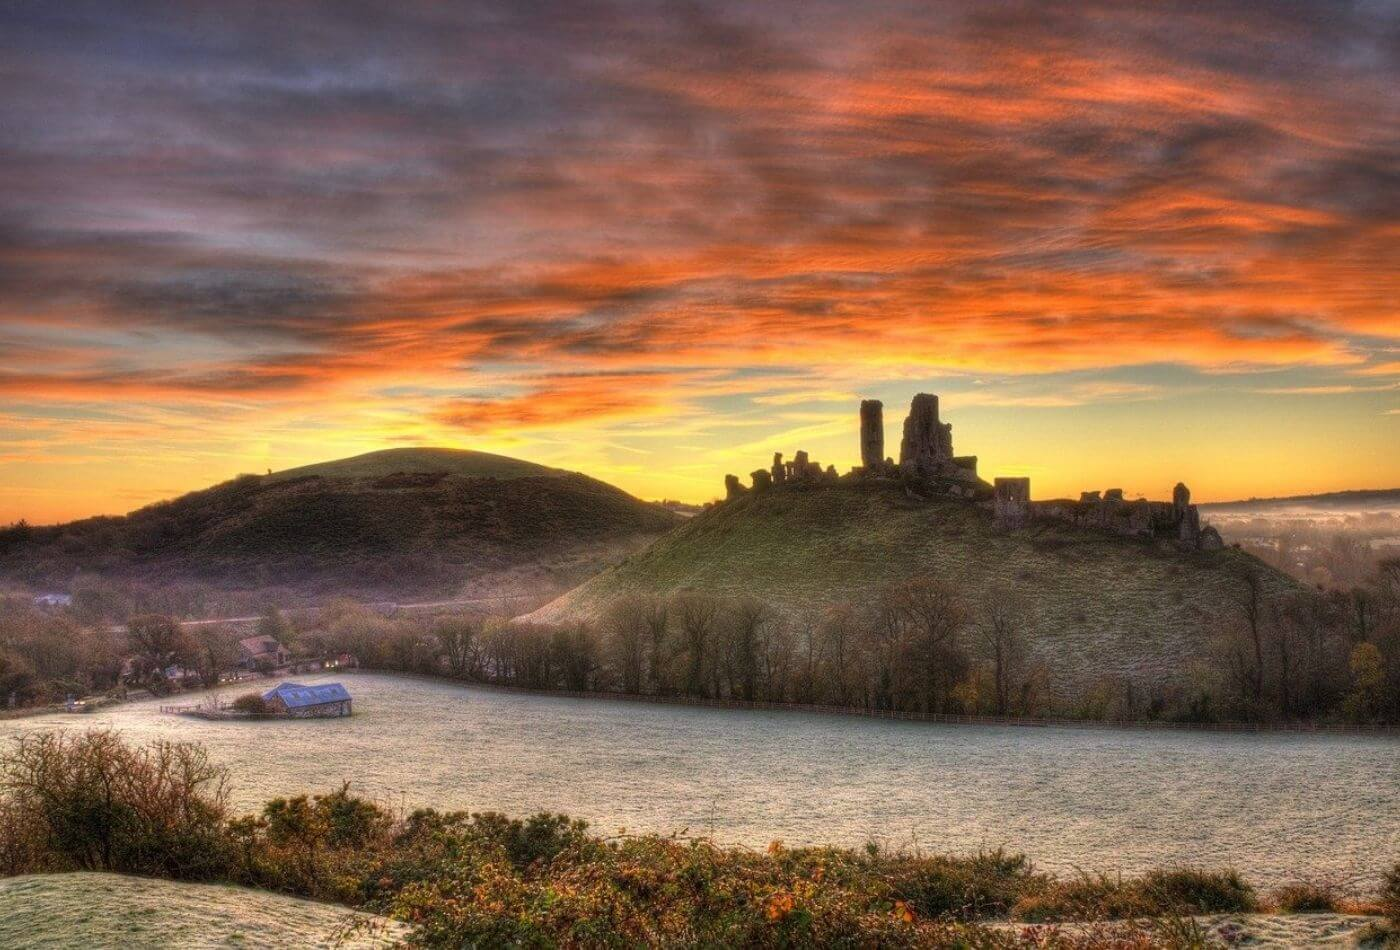 A scenic sunset over corfe castle, a popular dorset attraction